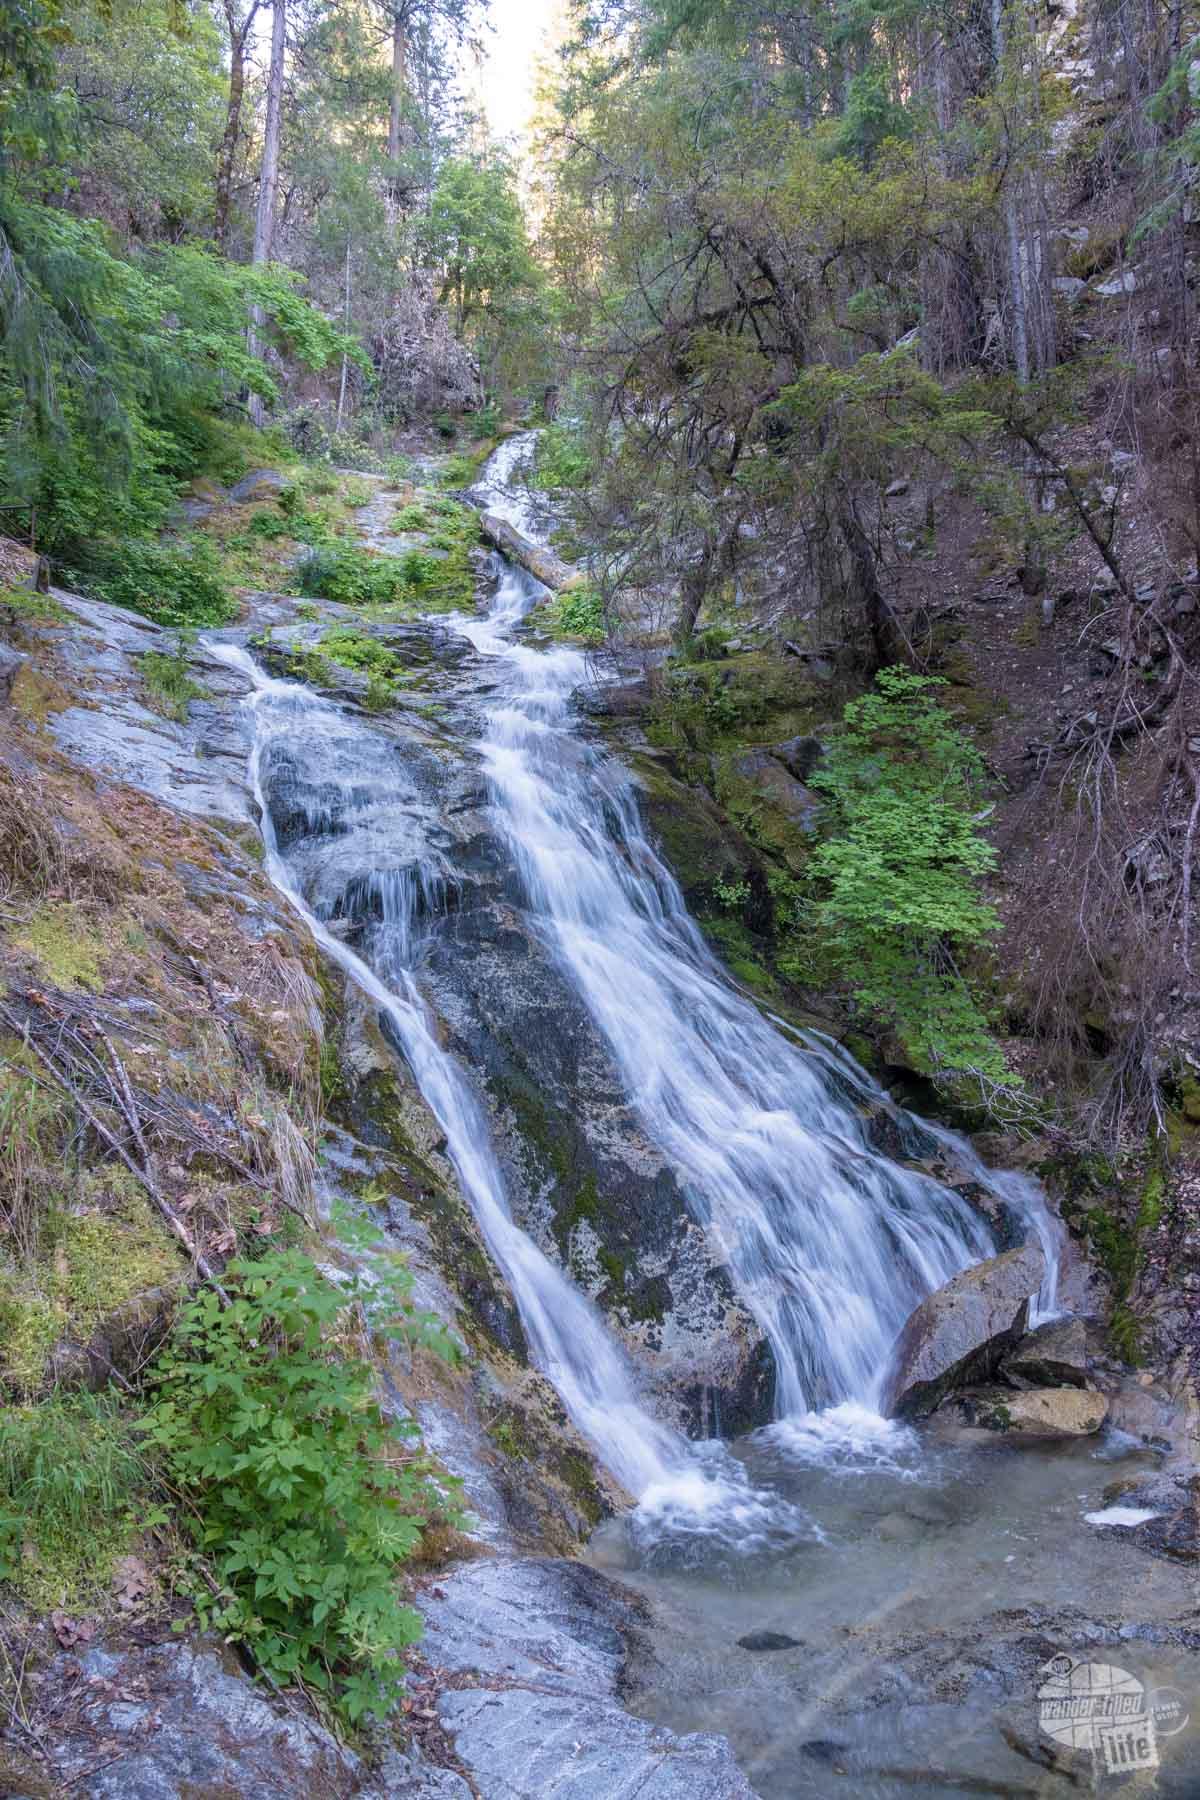 Upper Whiskeytown Falls